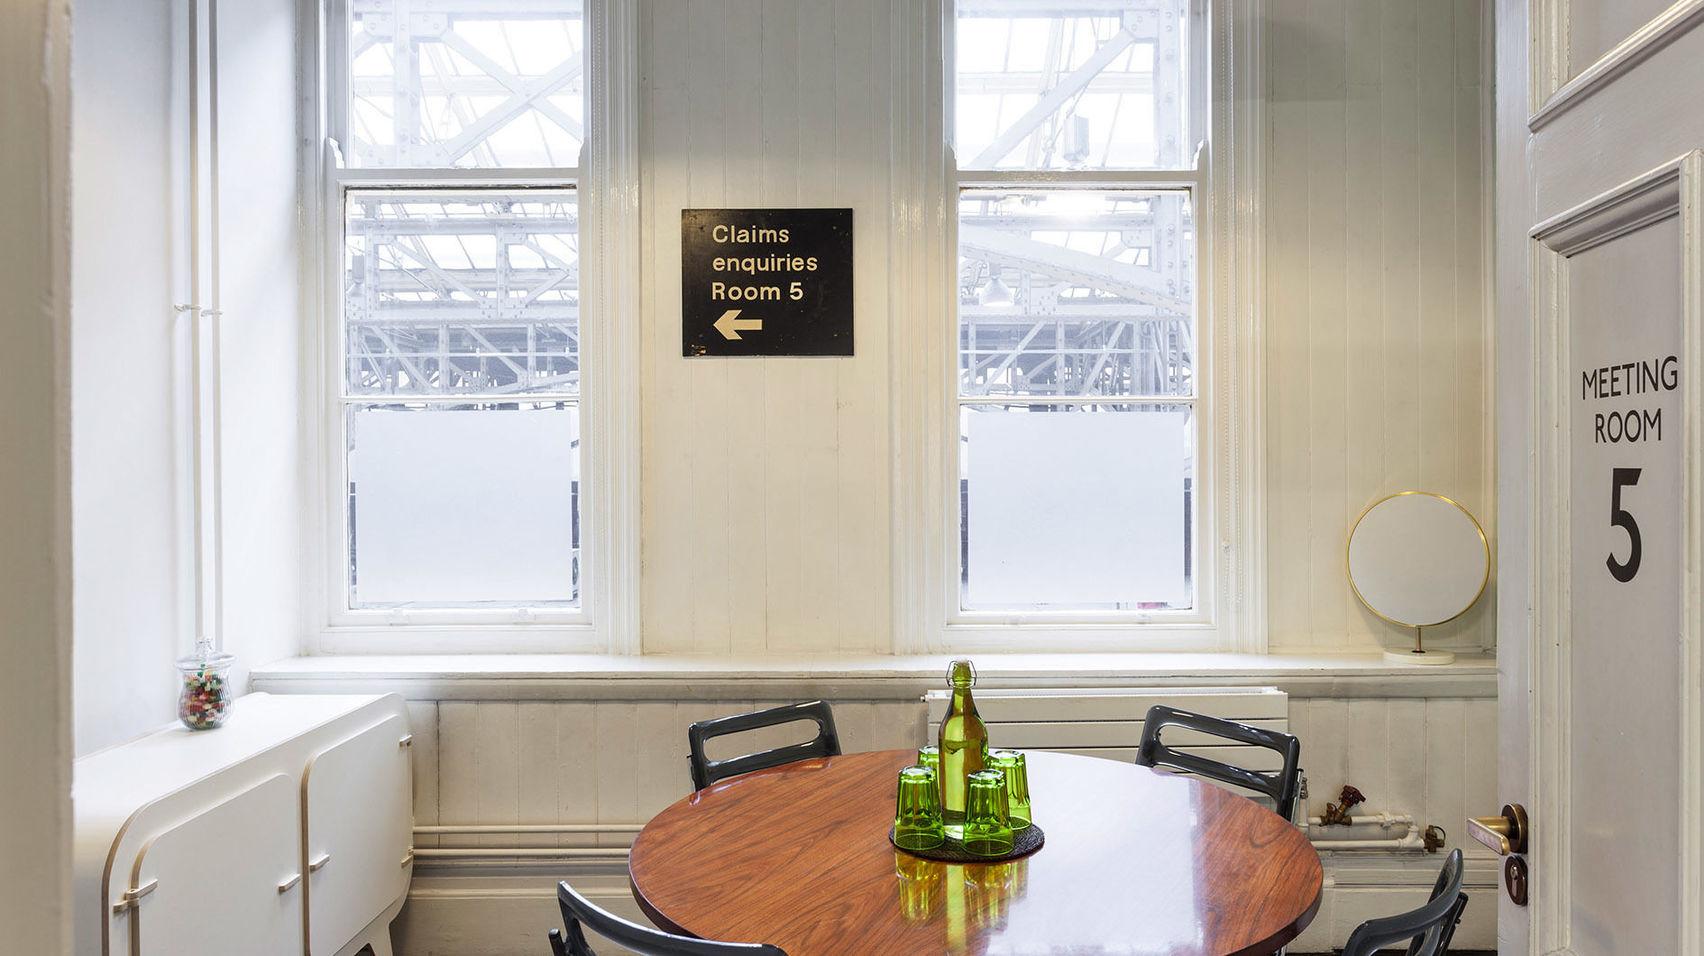 Meeting Room 5, TOG, Marylebone Station